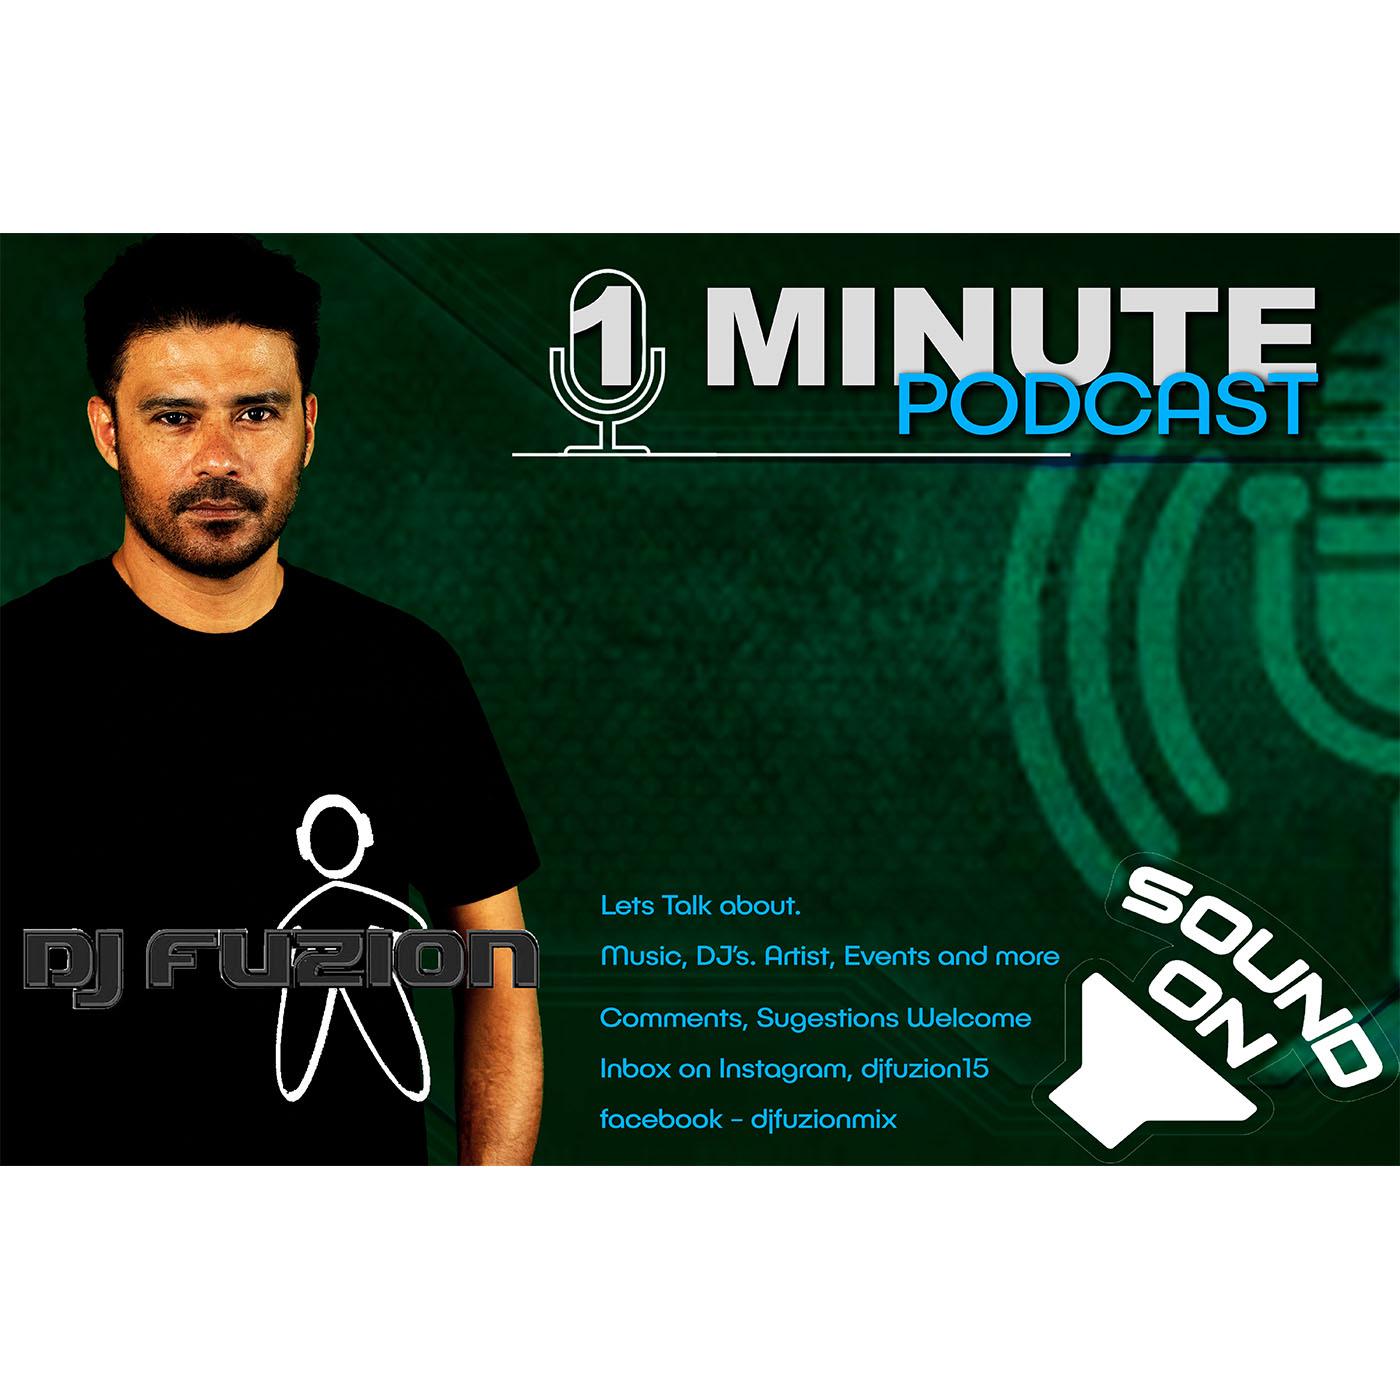 DJ FUZION PRESENTS - The 1 Minute PODCAST